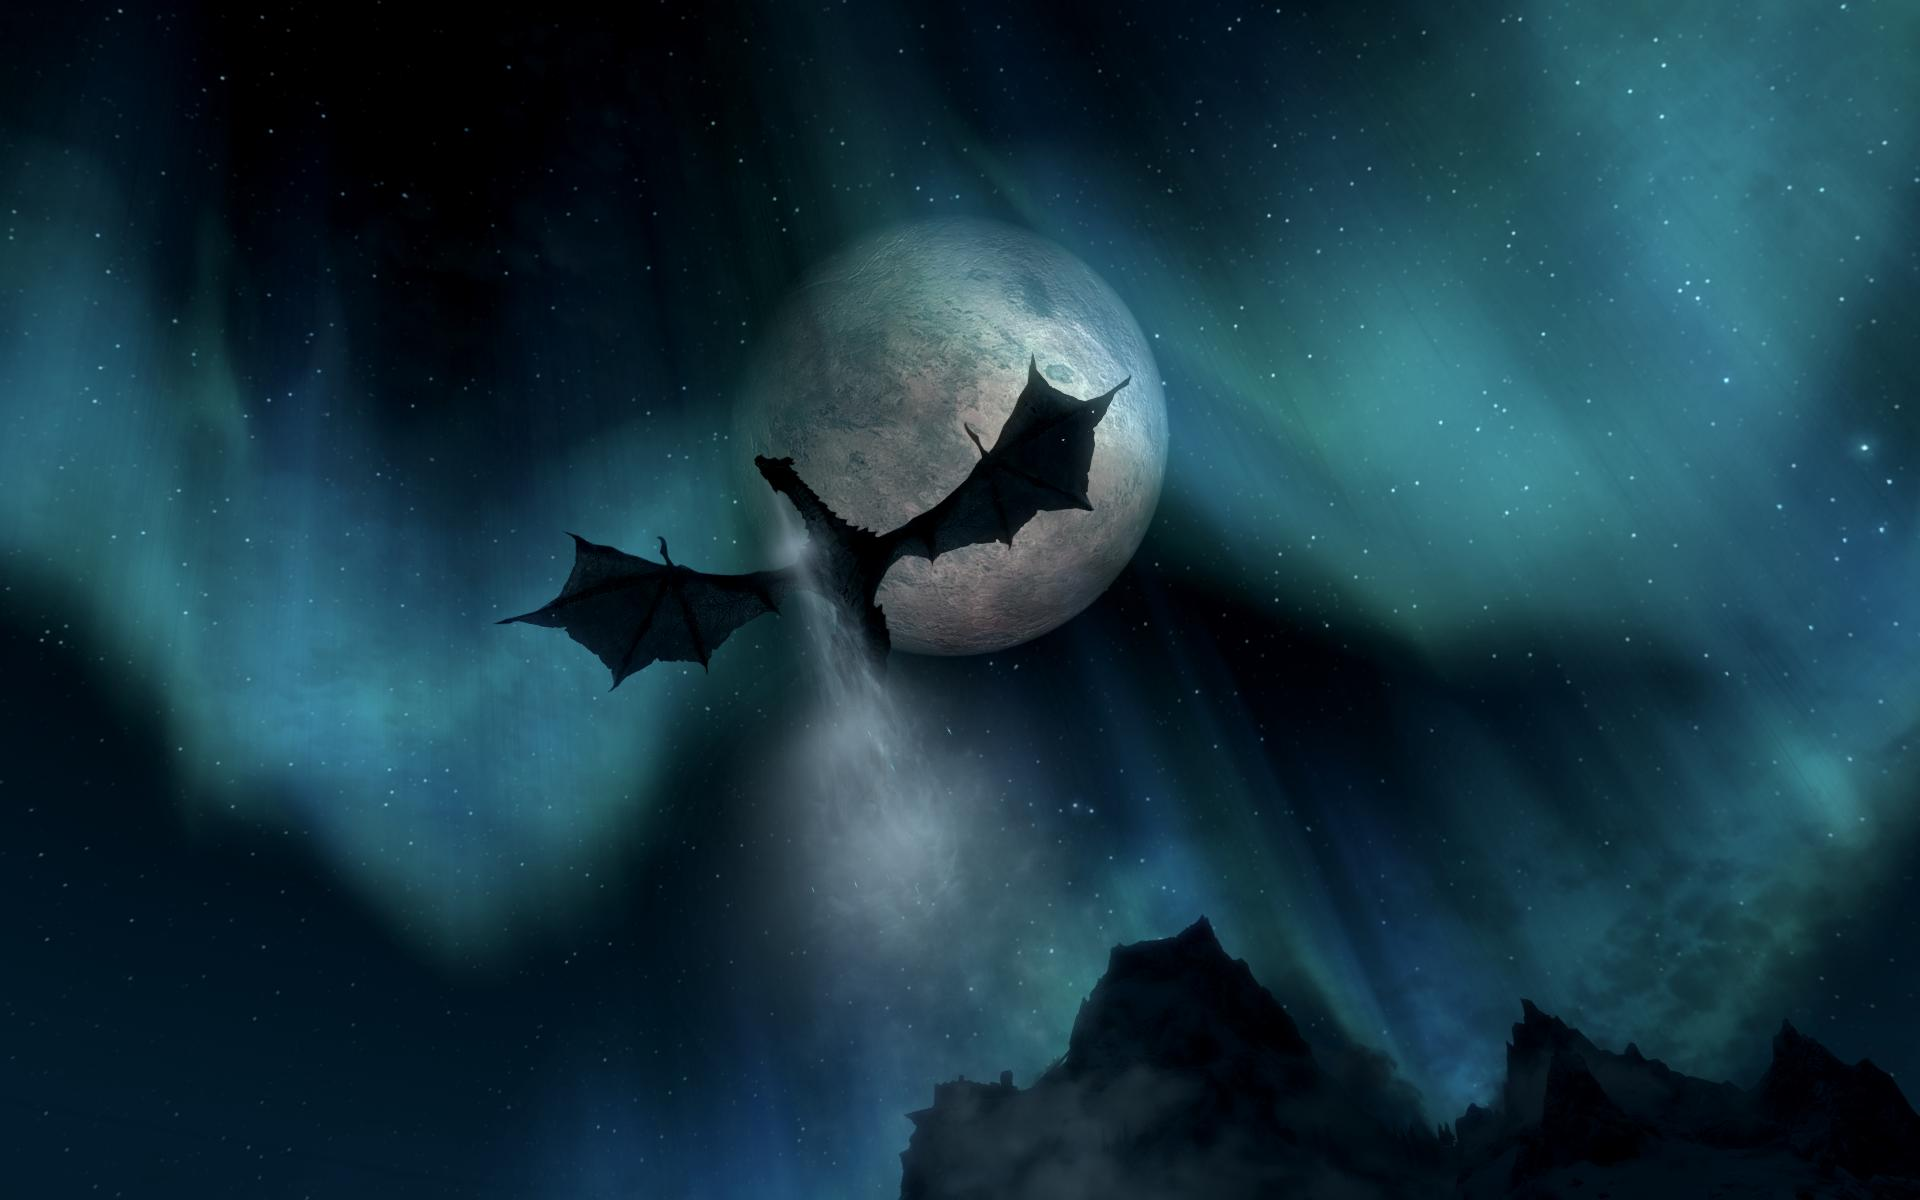 Aurora Dragon Wallpapers - Top Free Aurora Dragon